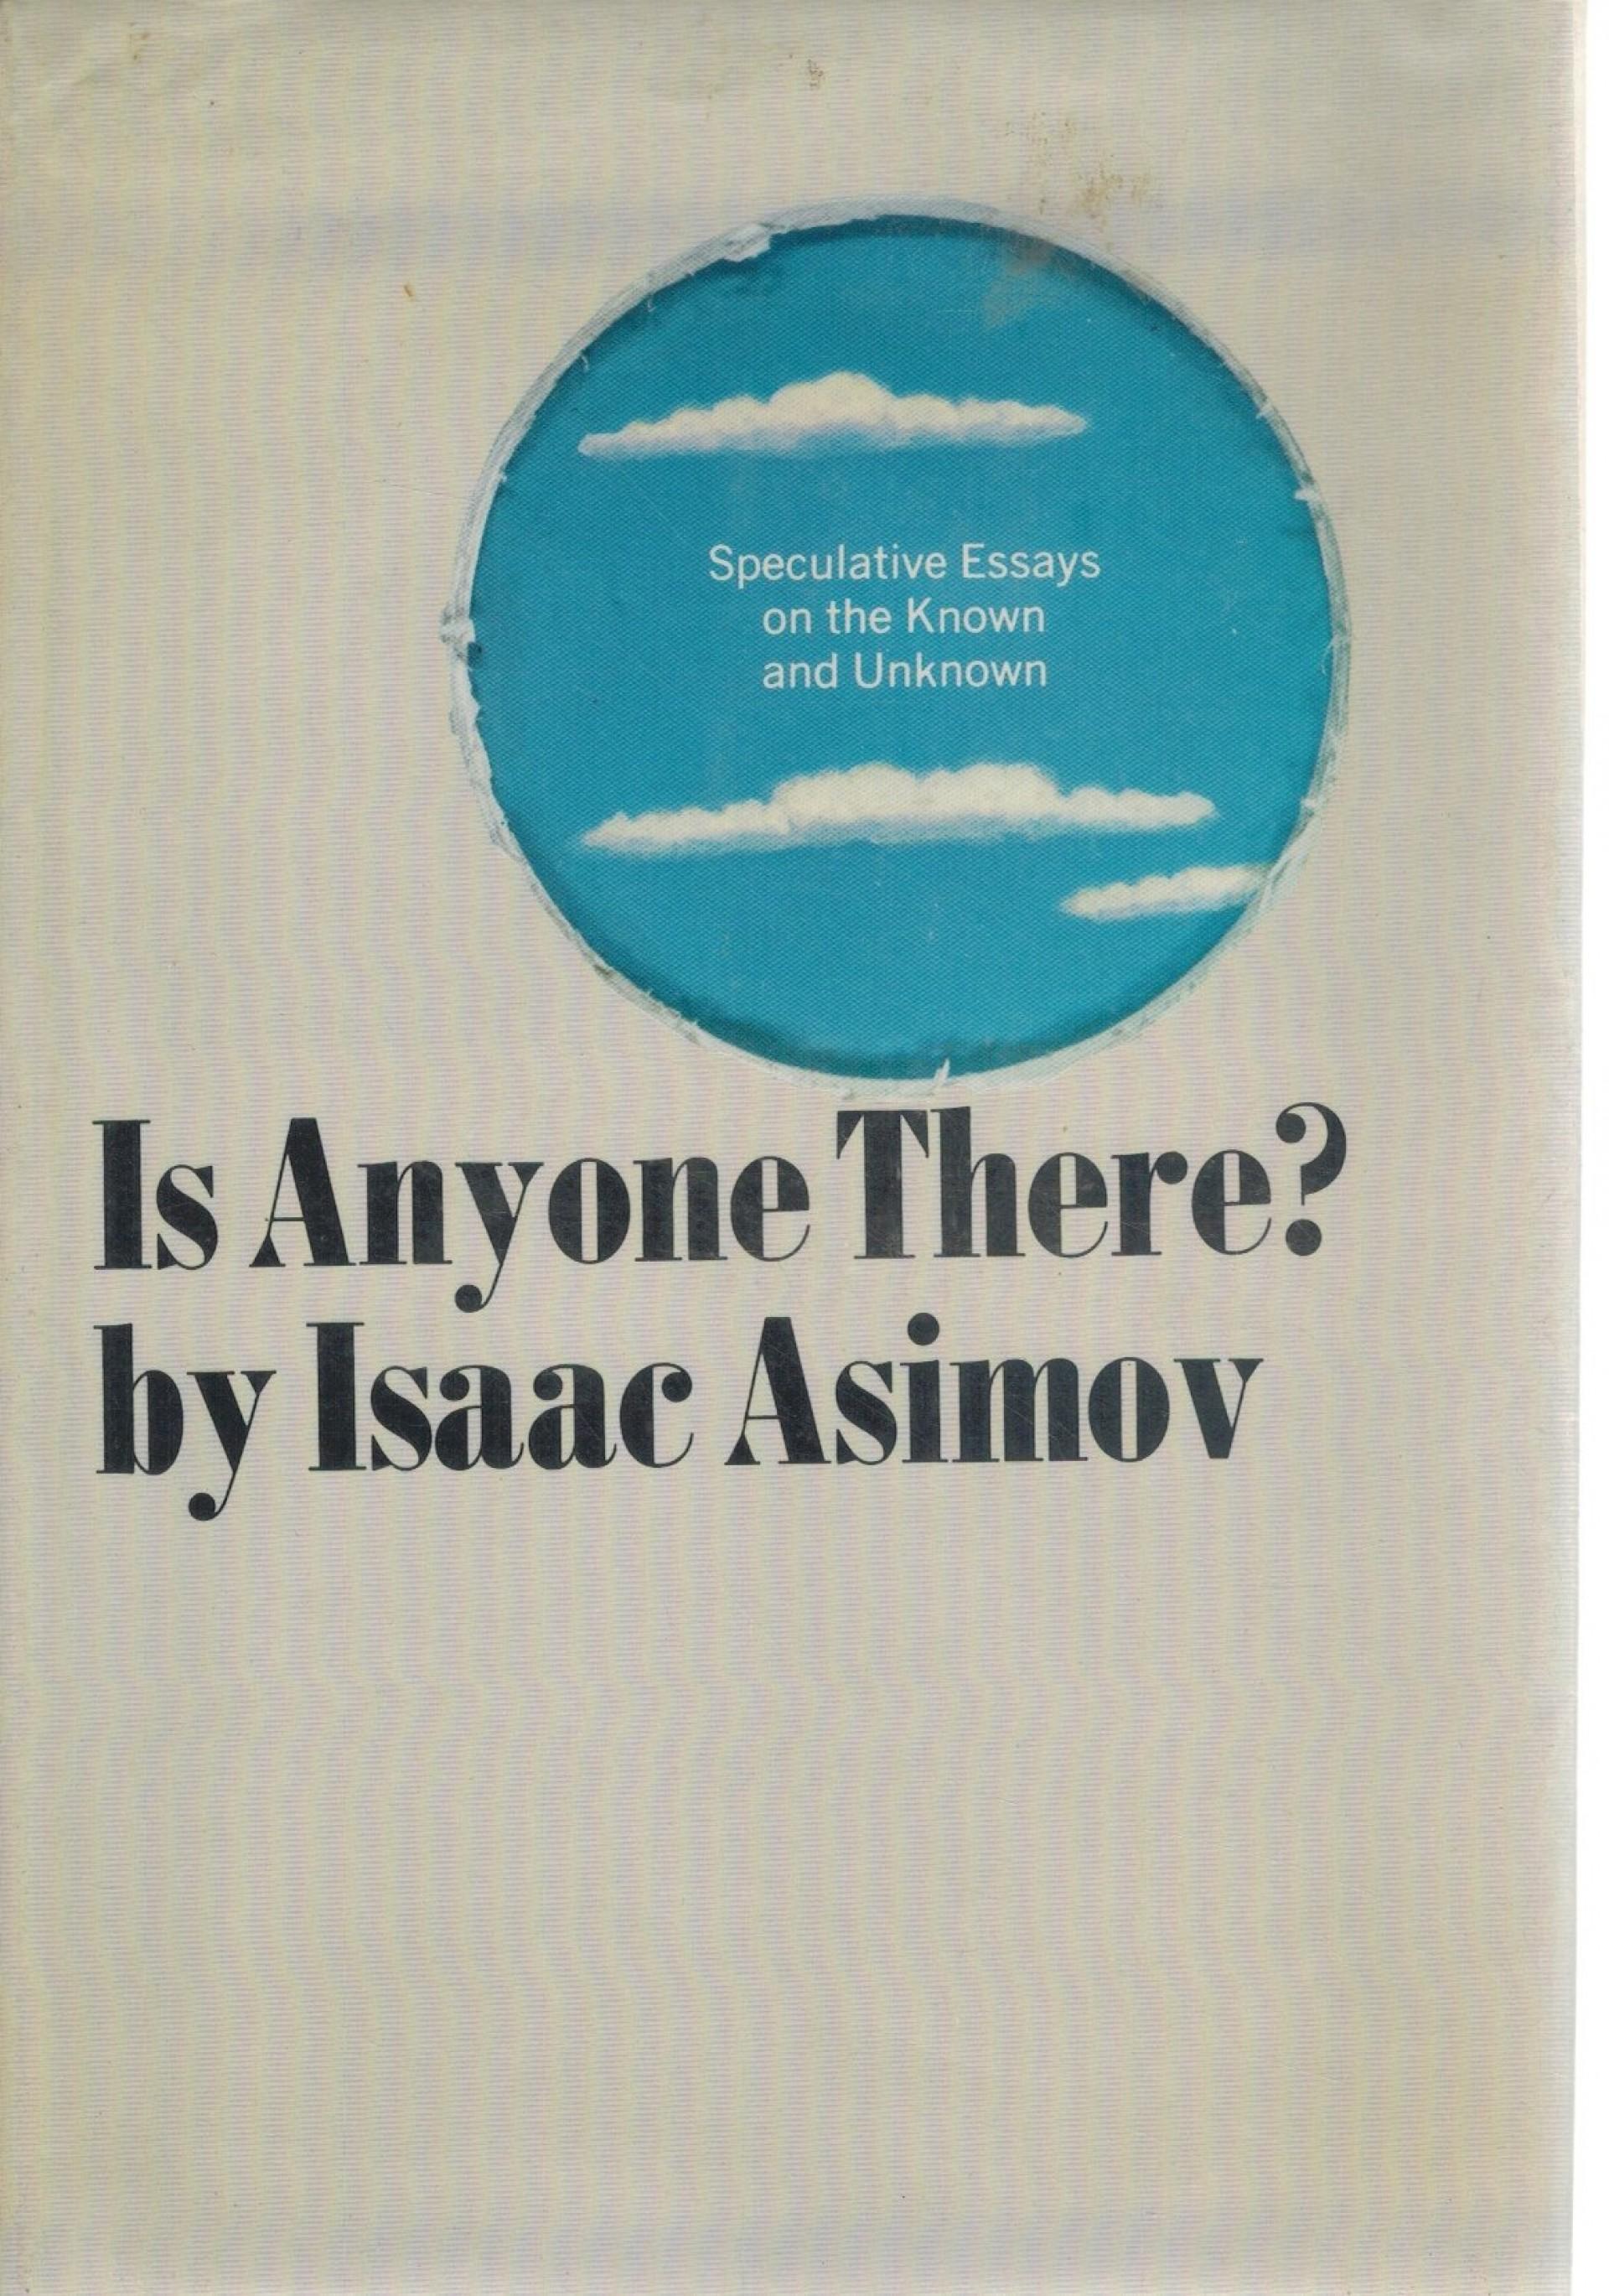 008 81xccmq2bmol Essay Example Isaac Asimov Awful Essays On Creativity Intelligence 1920